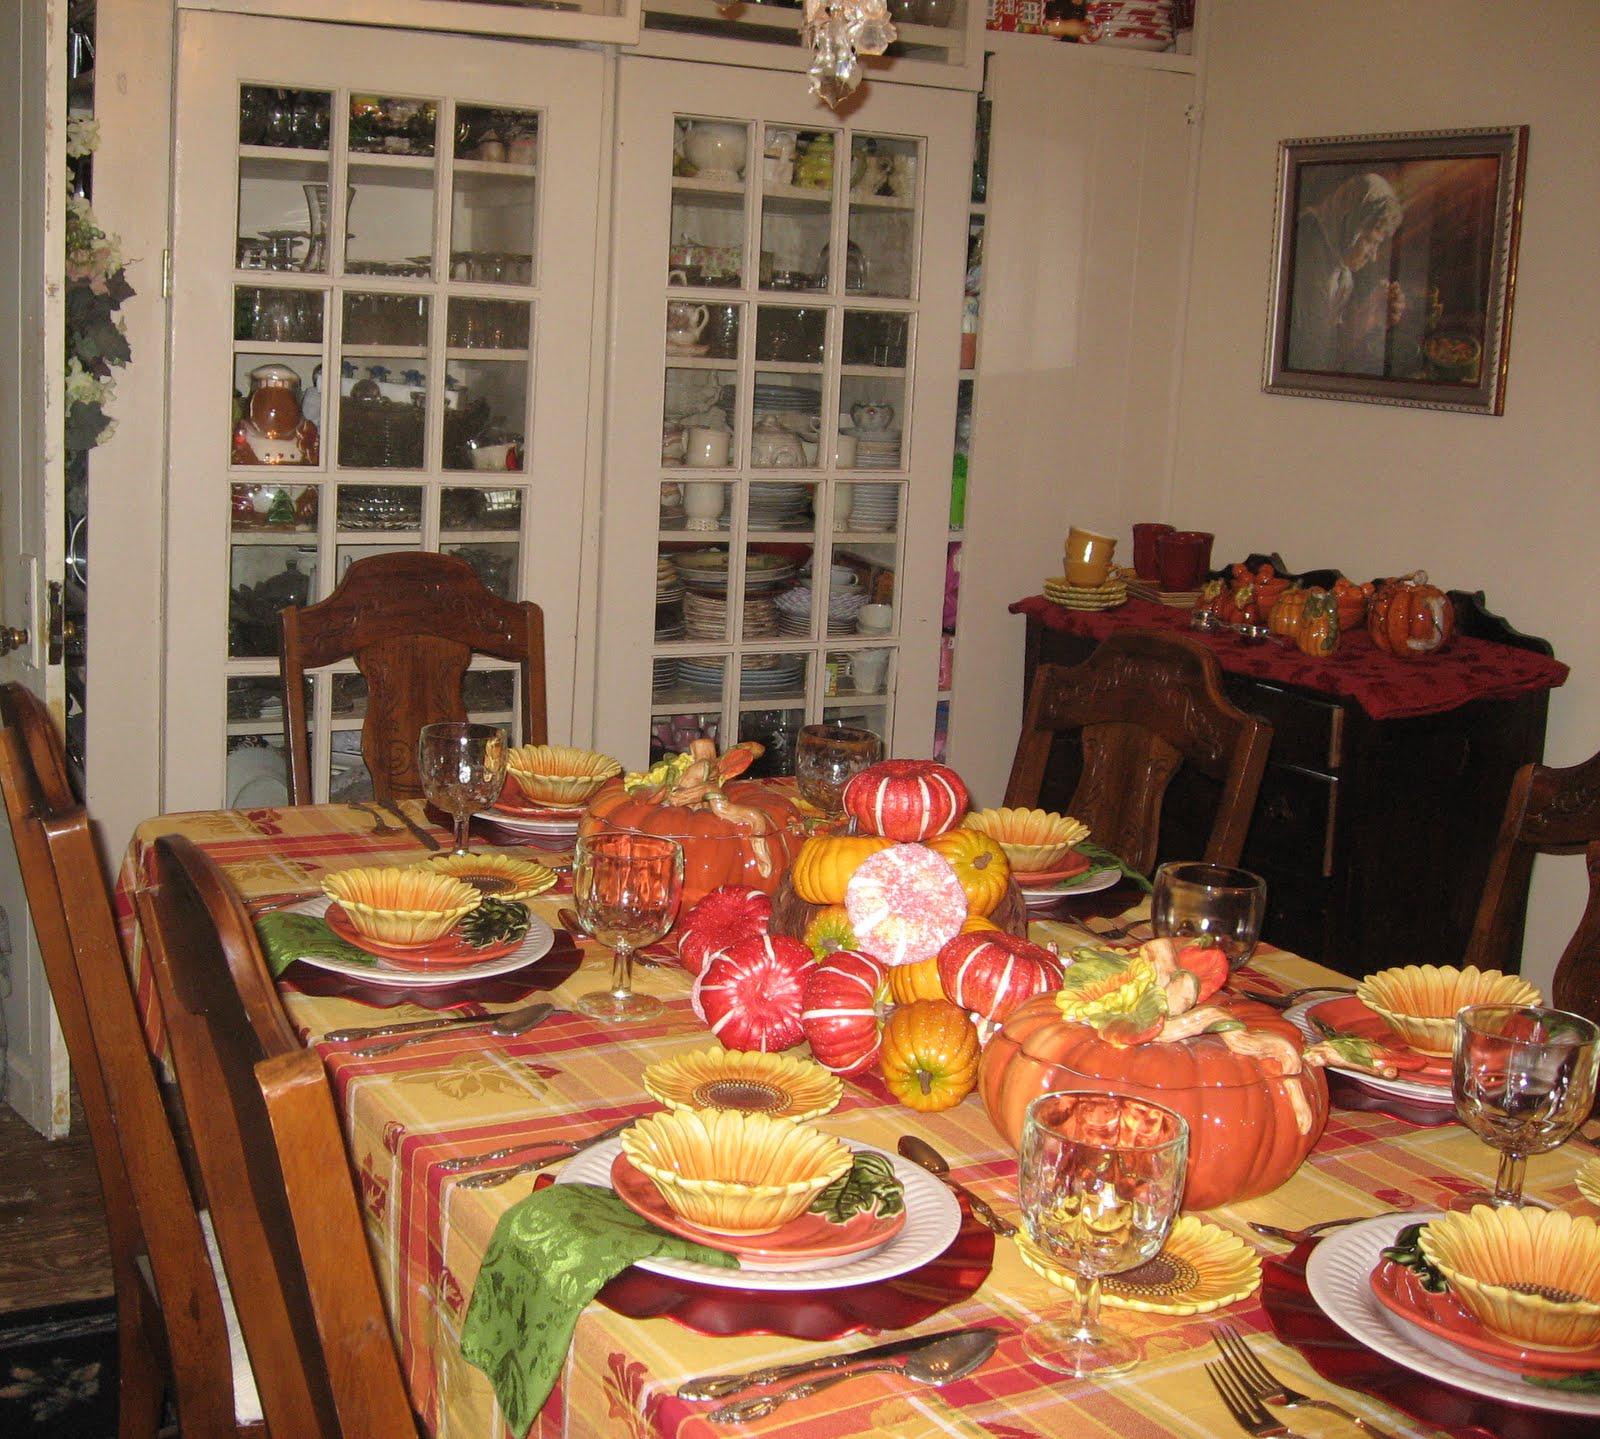 THANKSGIVING TABLESCAPE AND TEA TABLE & tea table setting | Lady Katherine Tea Parlor